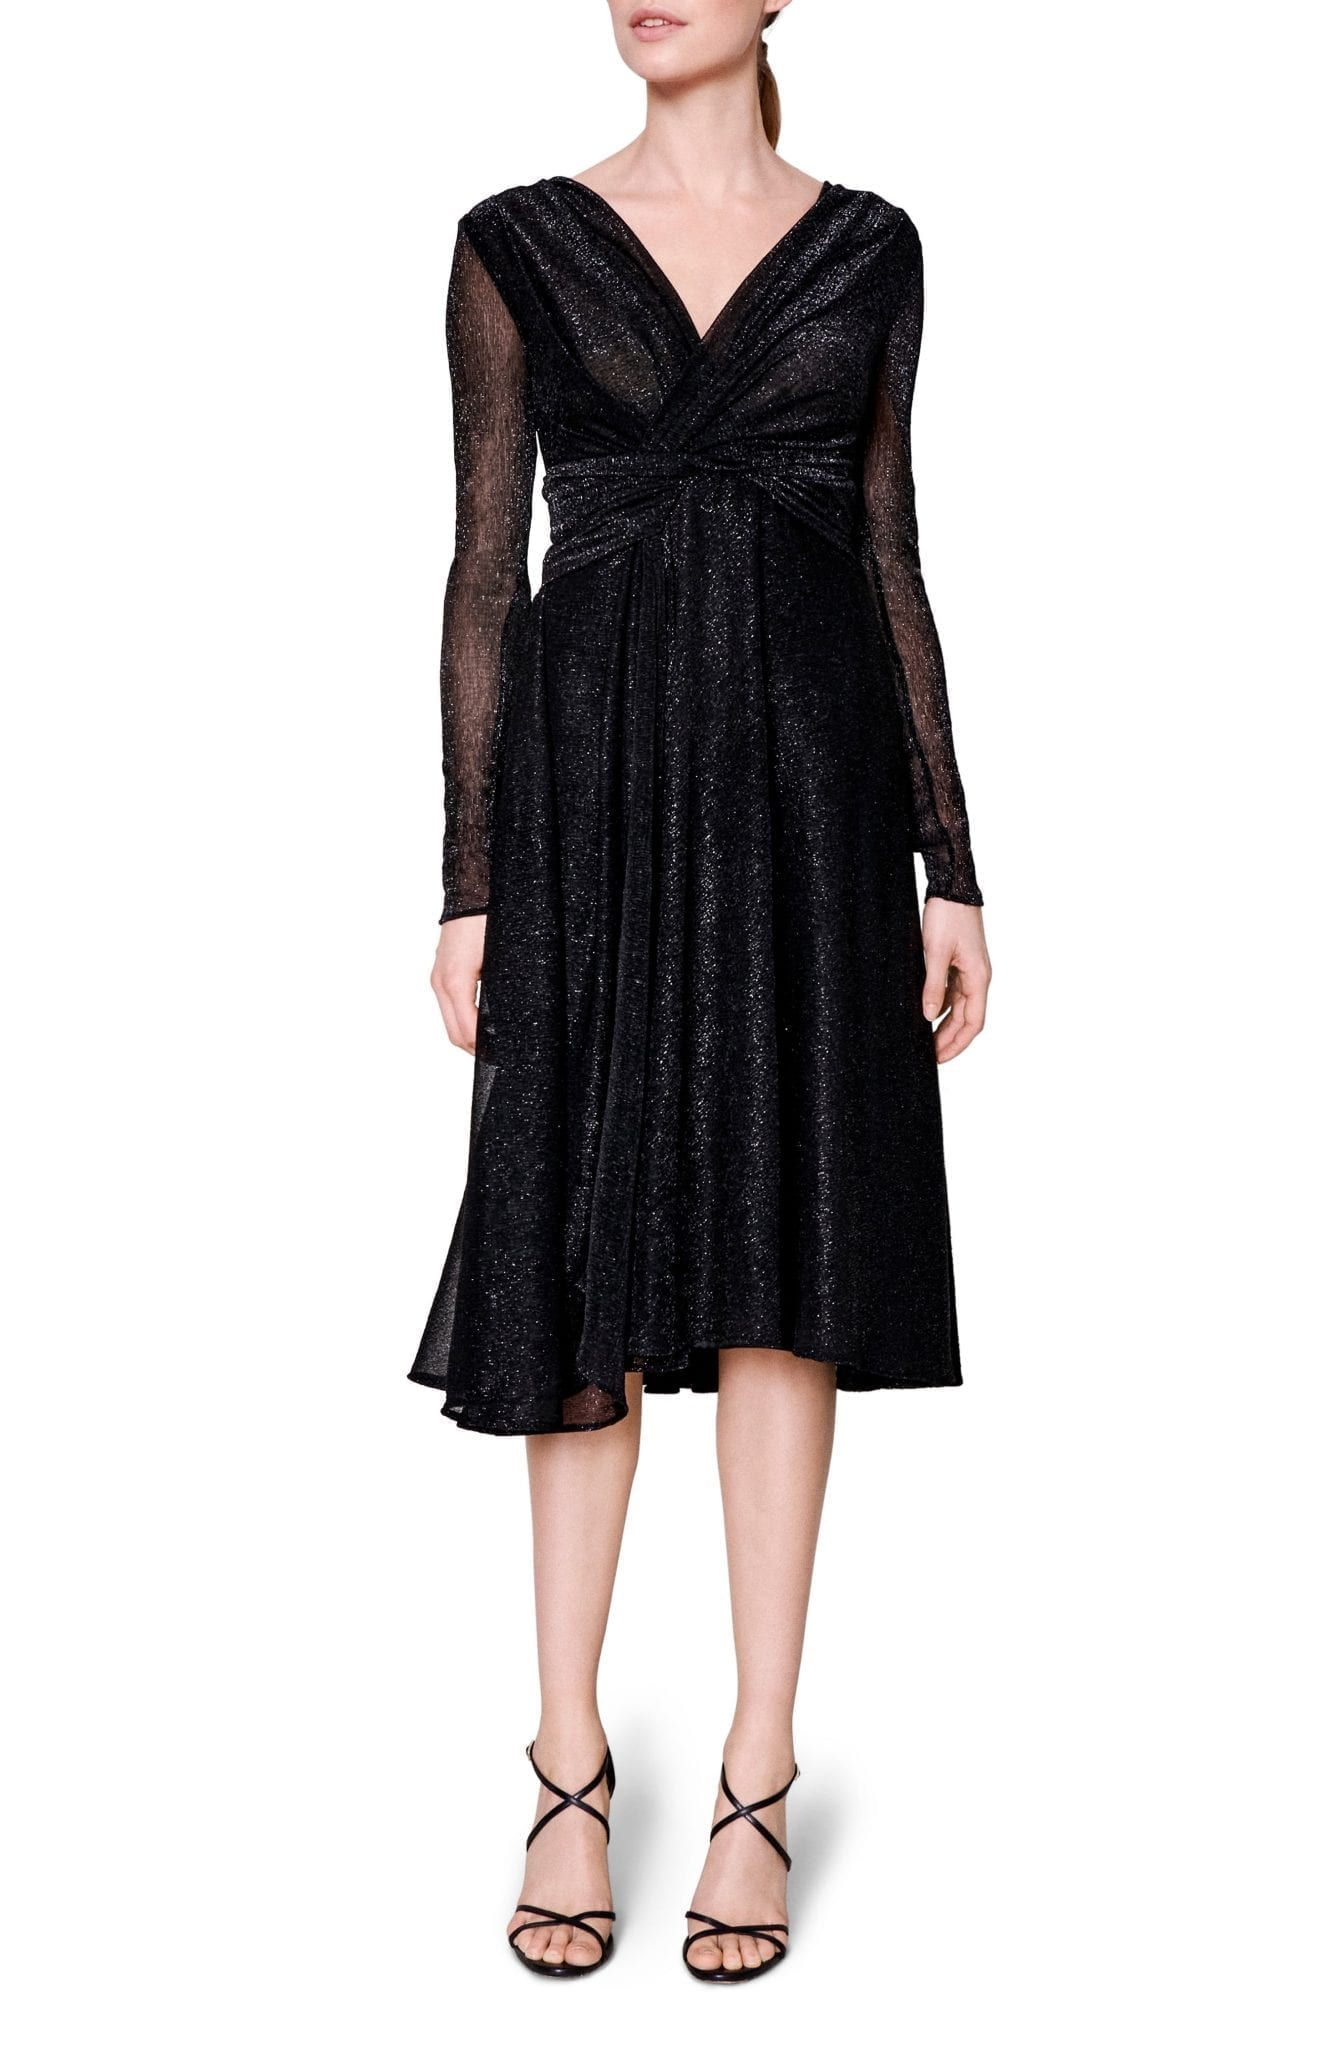 TALBOT RUNHOF Metallic Voile Long Sleeve Dress